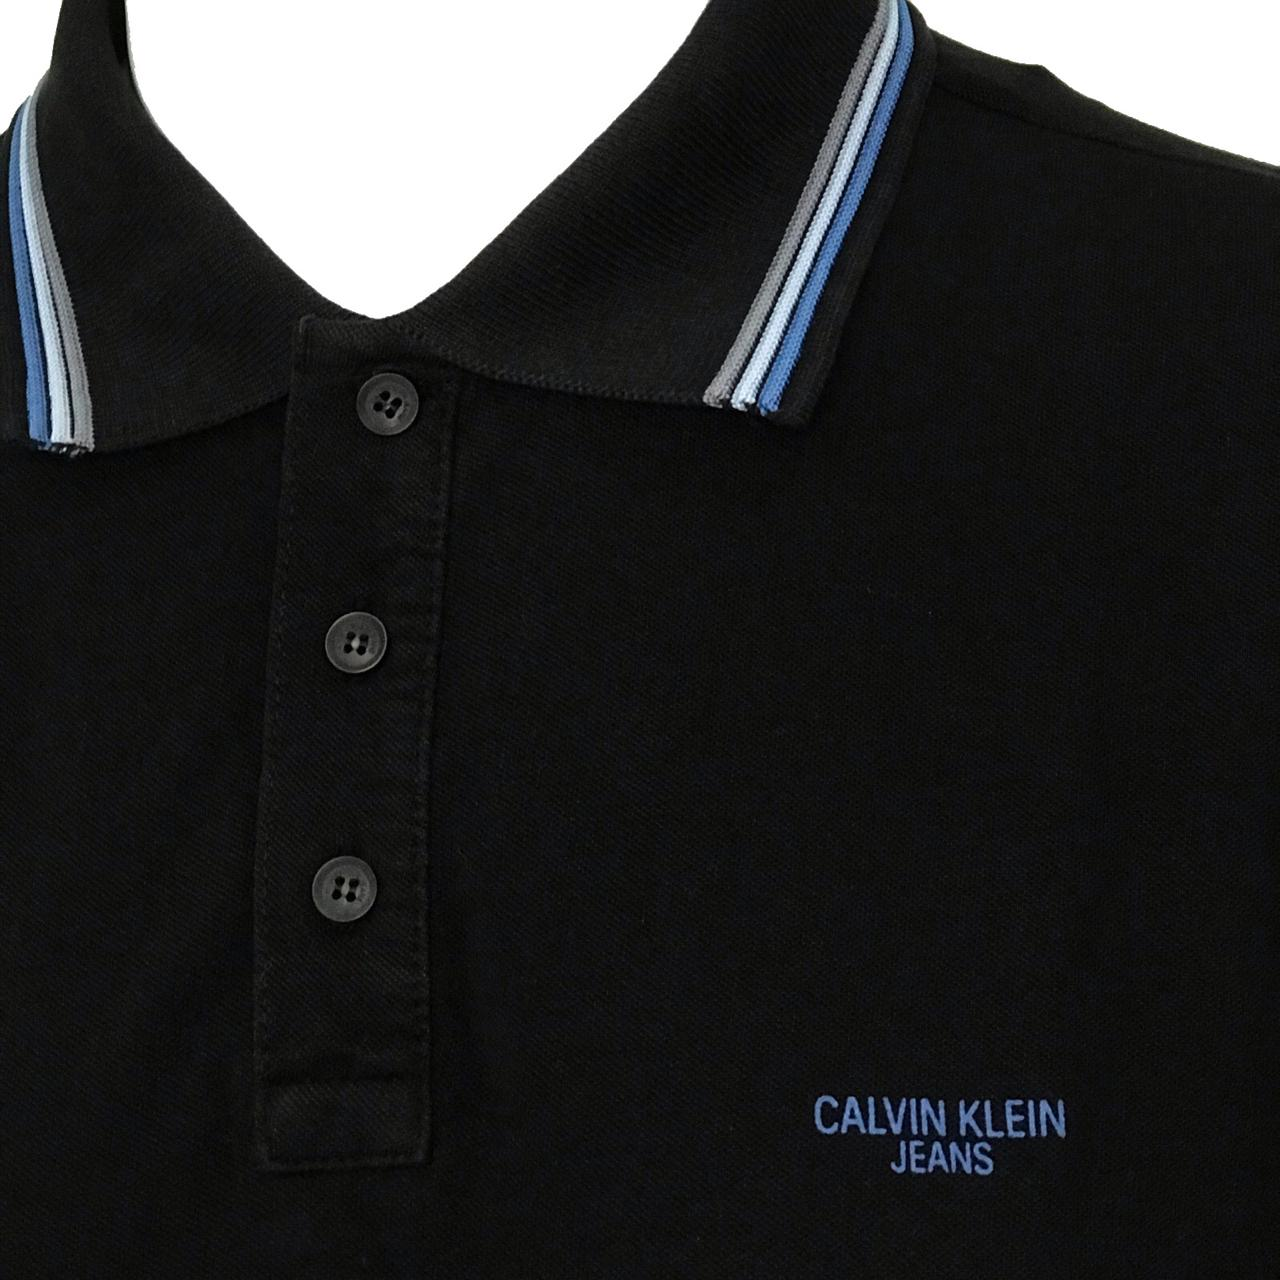 Polo Calvin Klein Jeans Manga Curta Em Piquet, Gola E Punhos De Retilínea